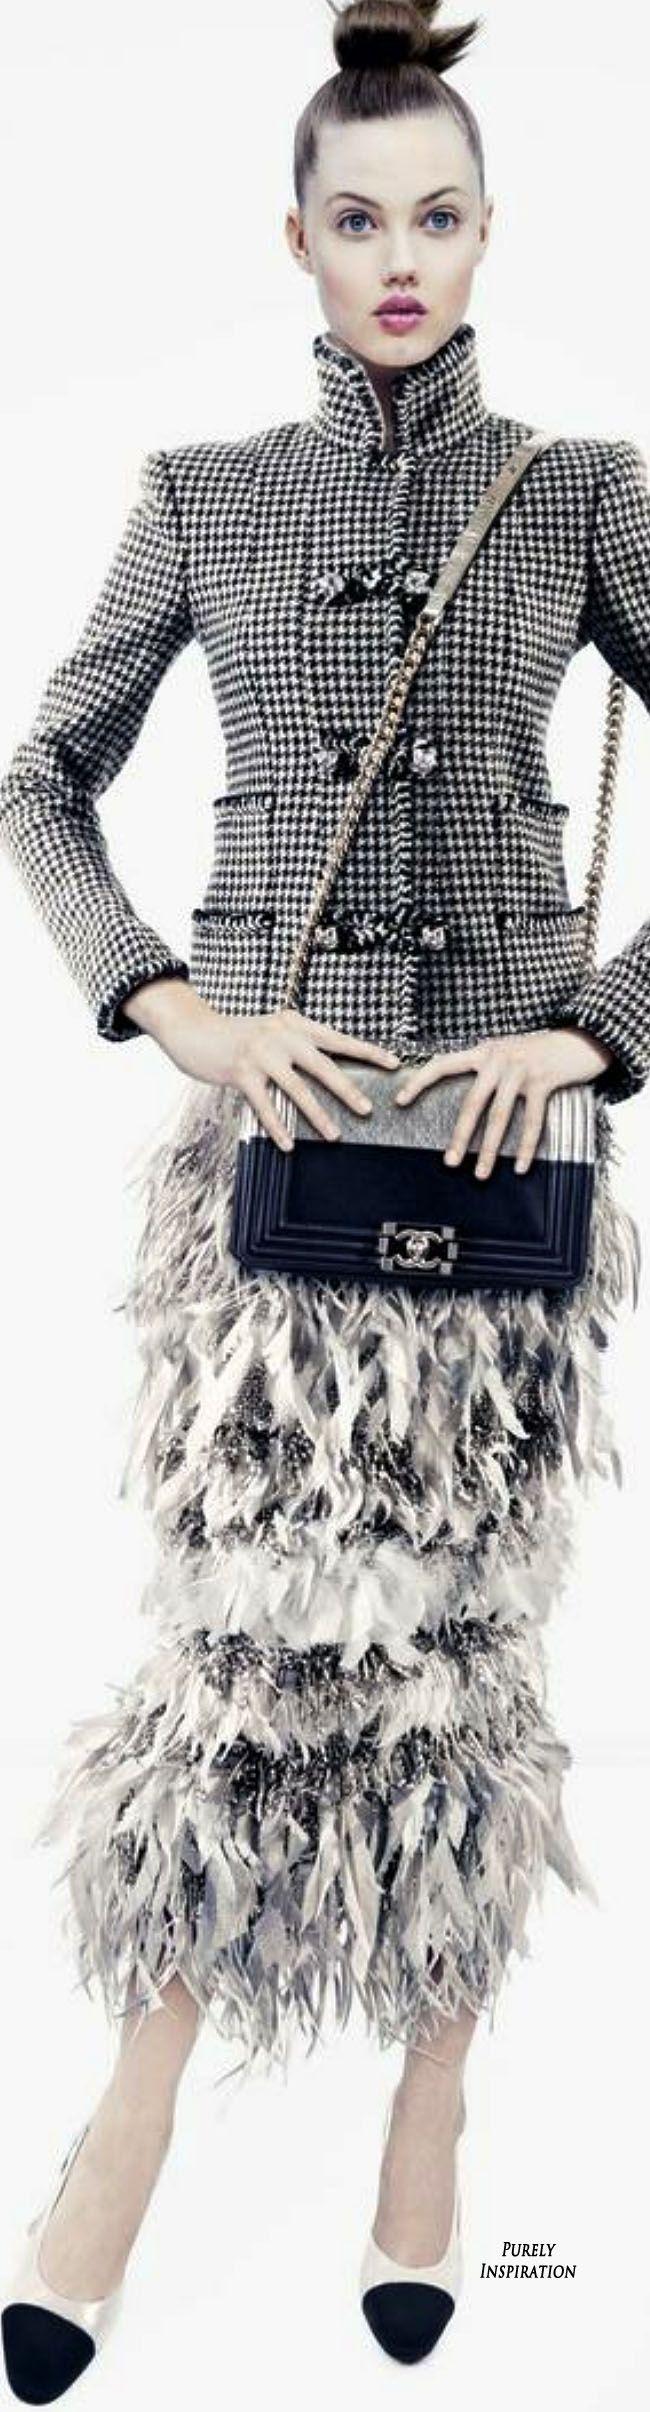 www.2locos.com  Chanel Autumn/Winter 2015 Ready-to-Wear